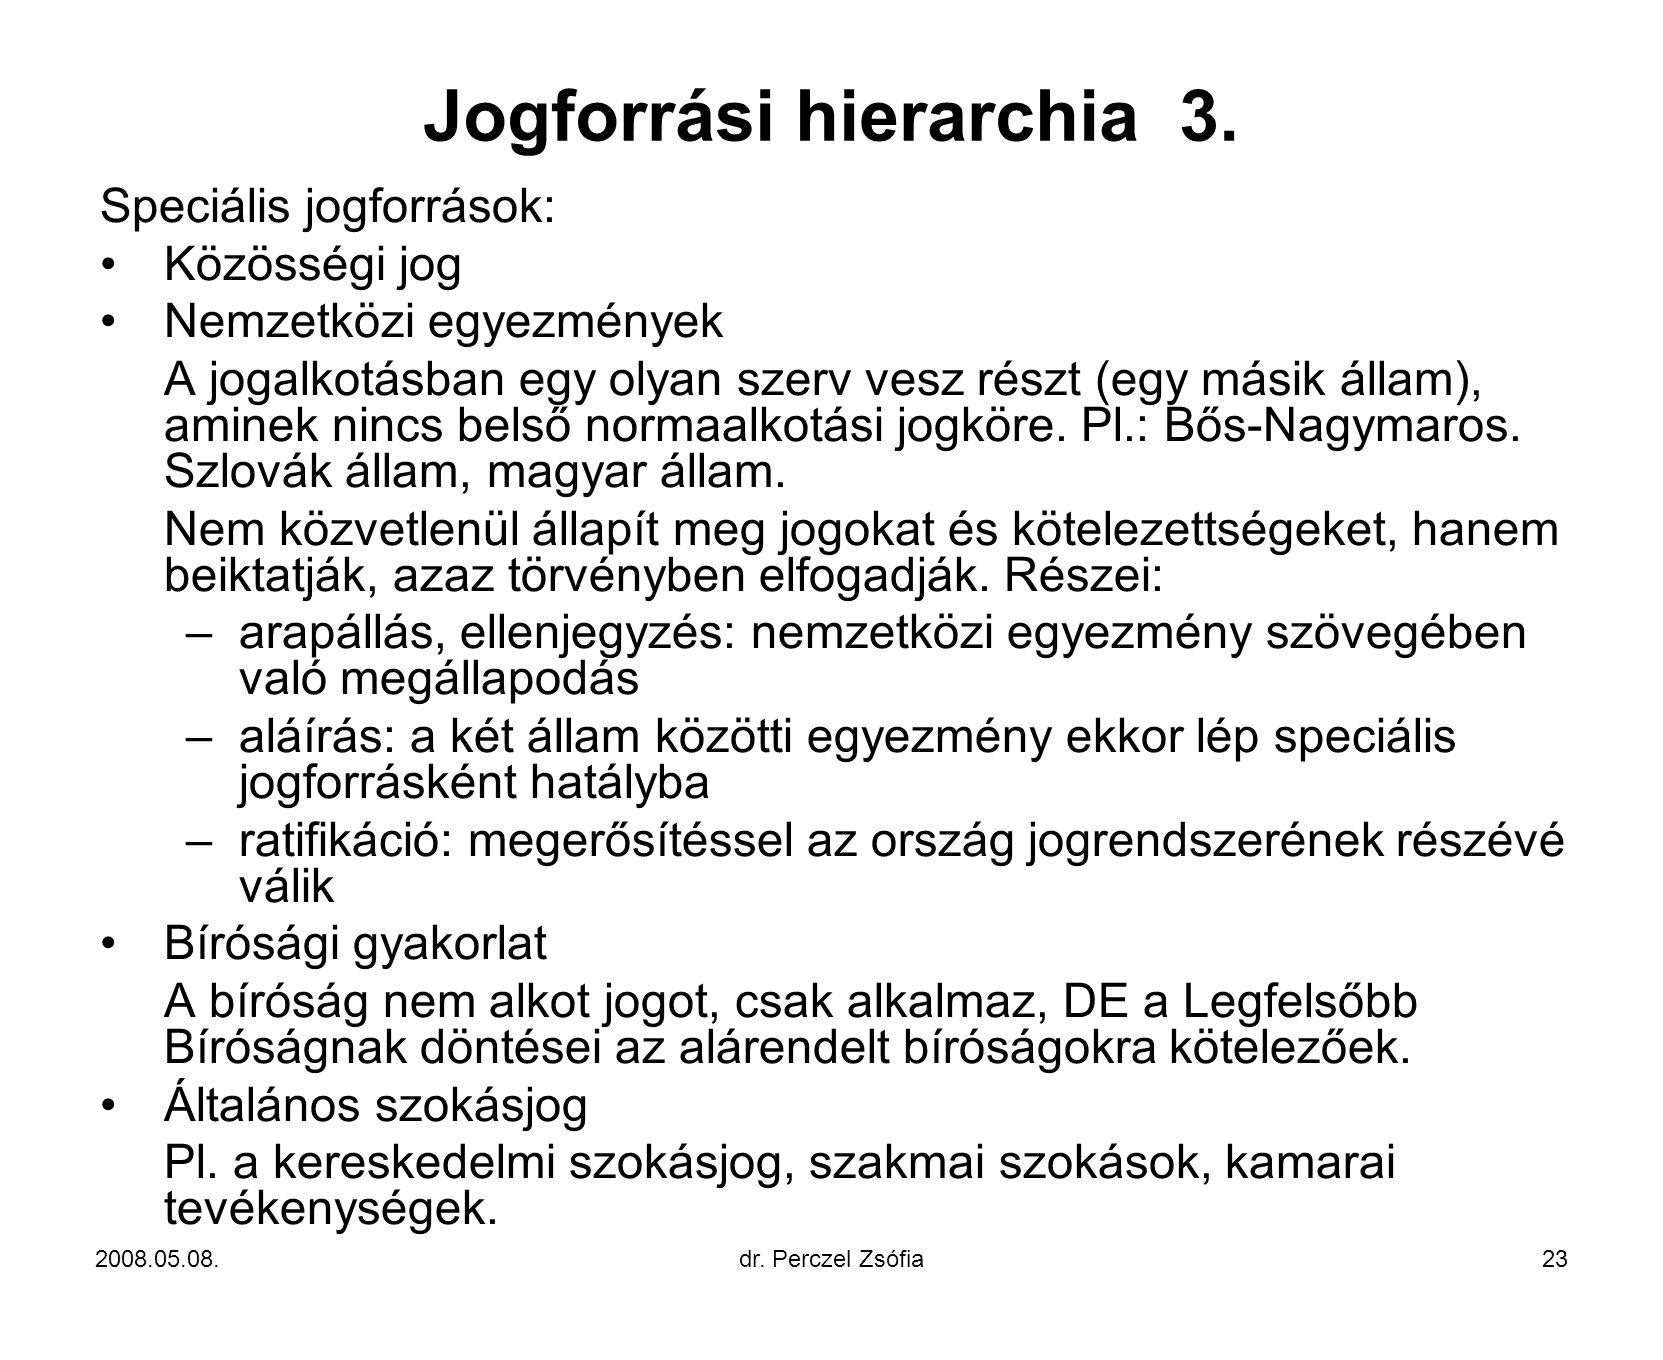 Jogforrási hierarchia 3.